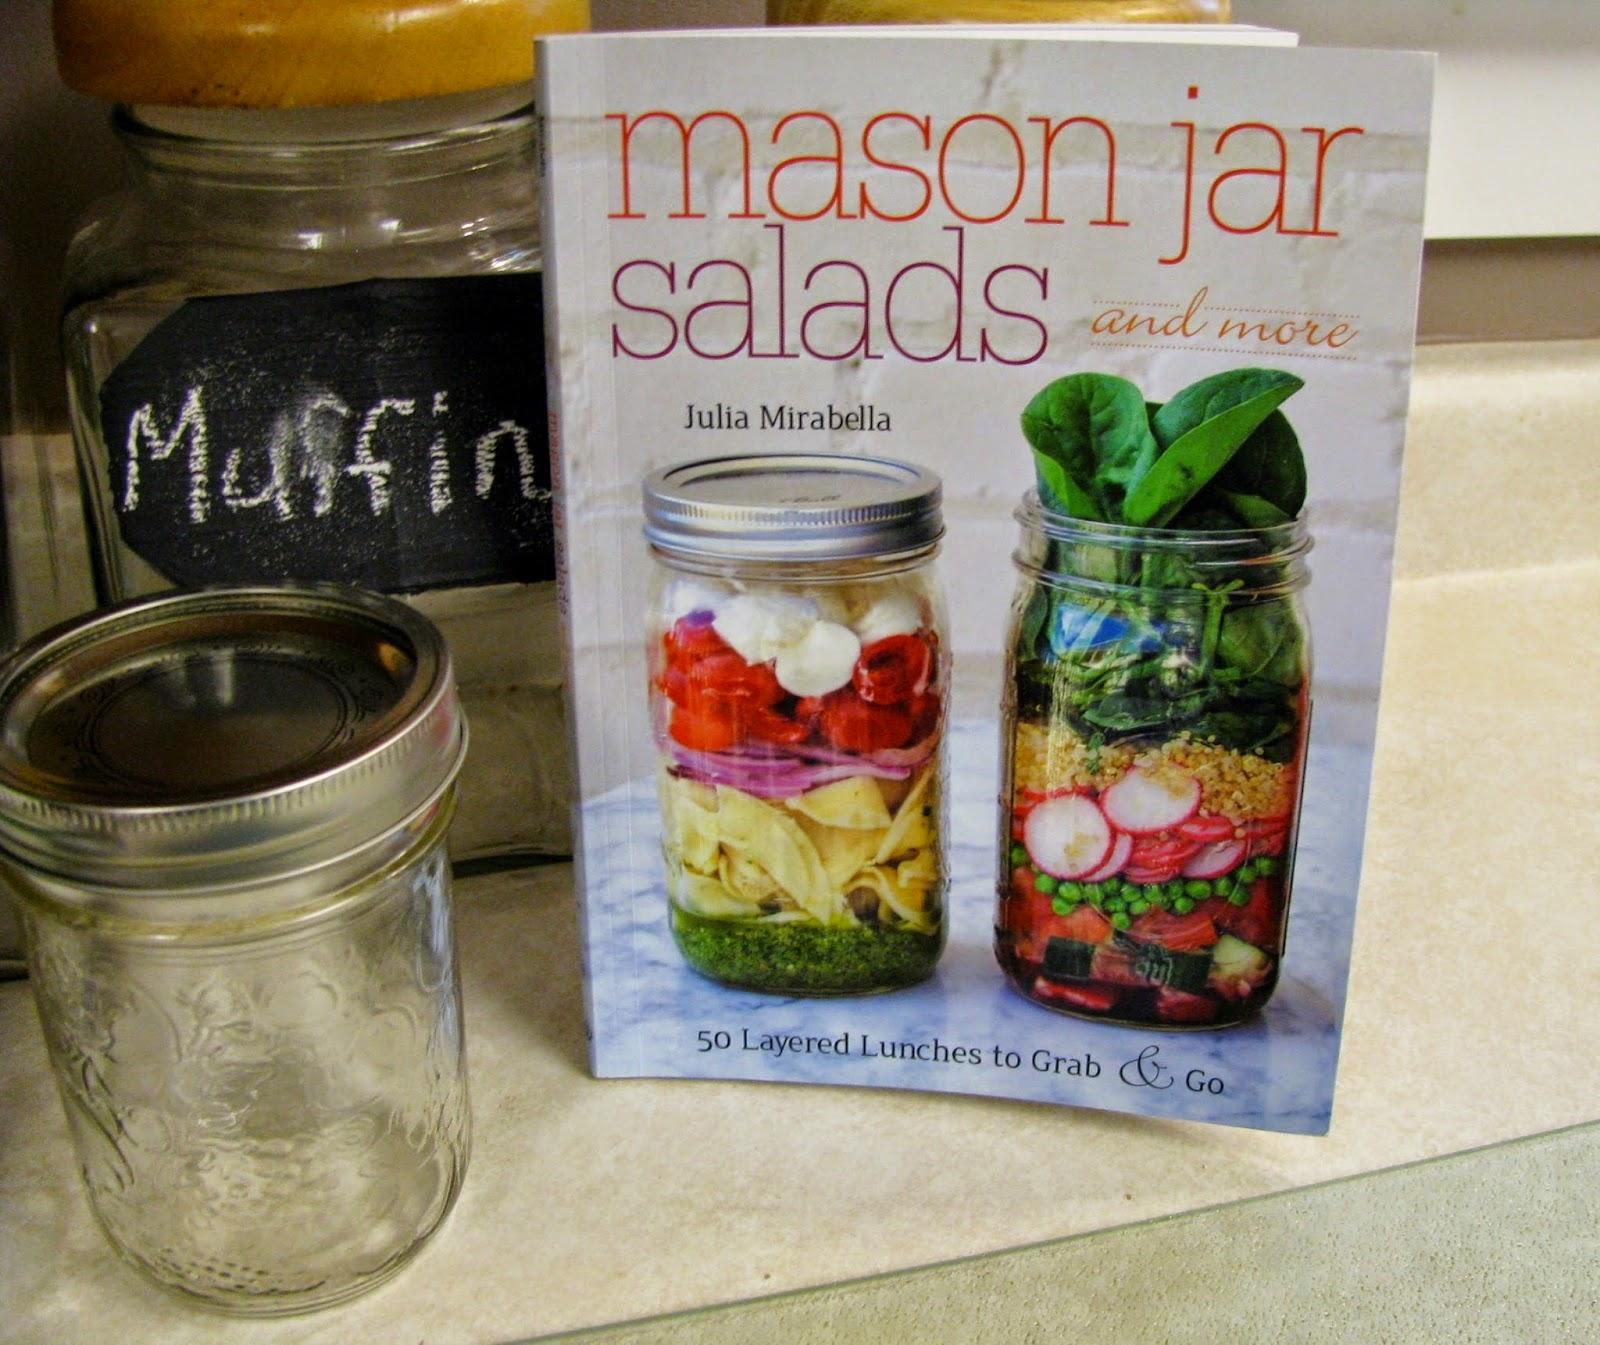 mason jar salads and more:chapter two salads